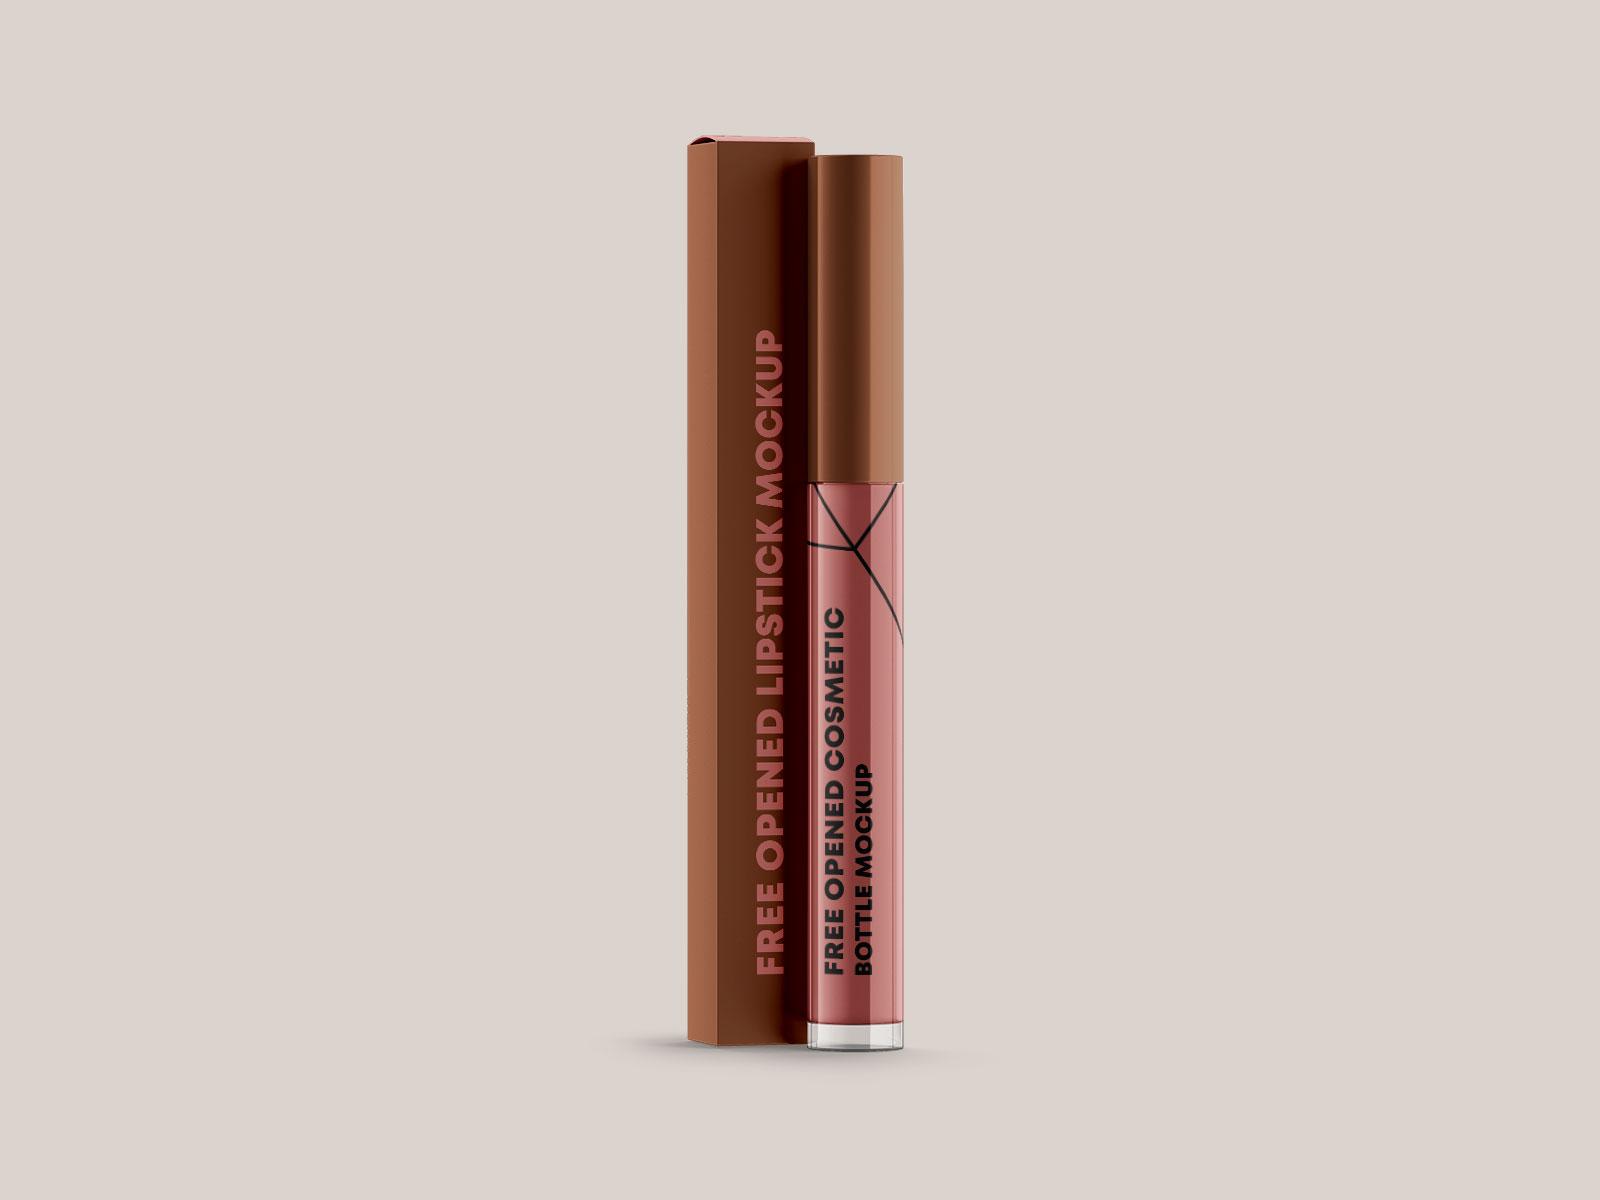 Free Lip Gloss Tube Vial Container Mockup PSD Set